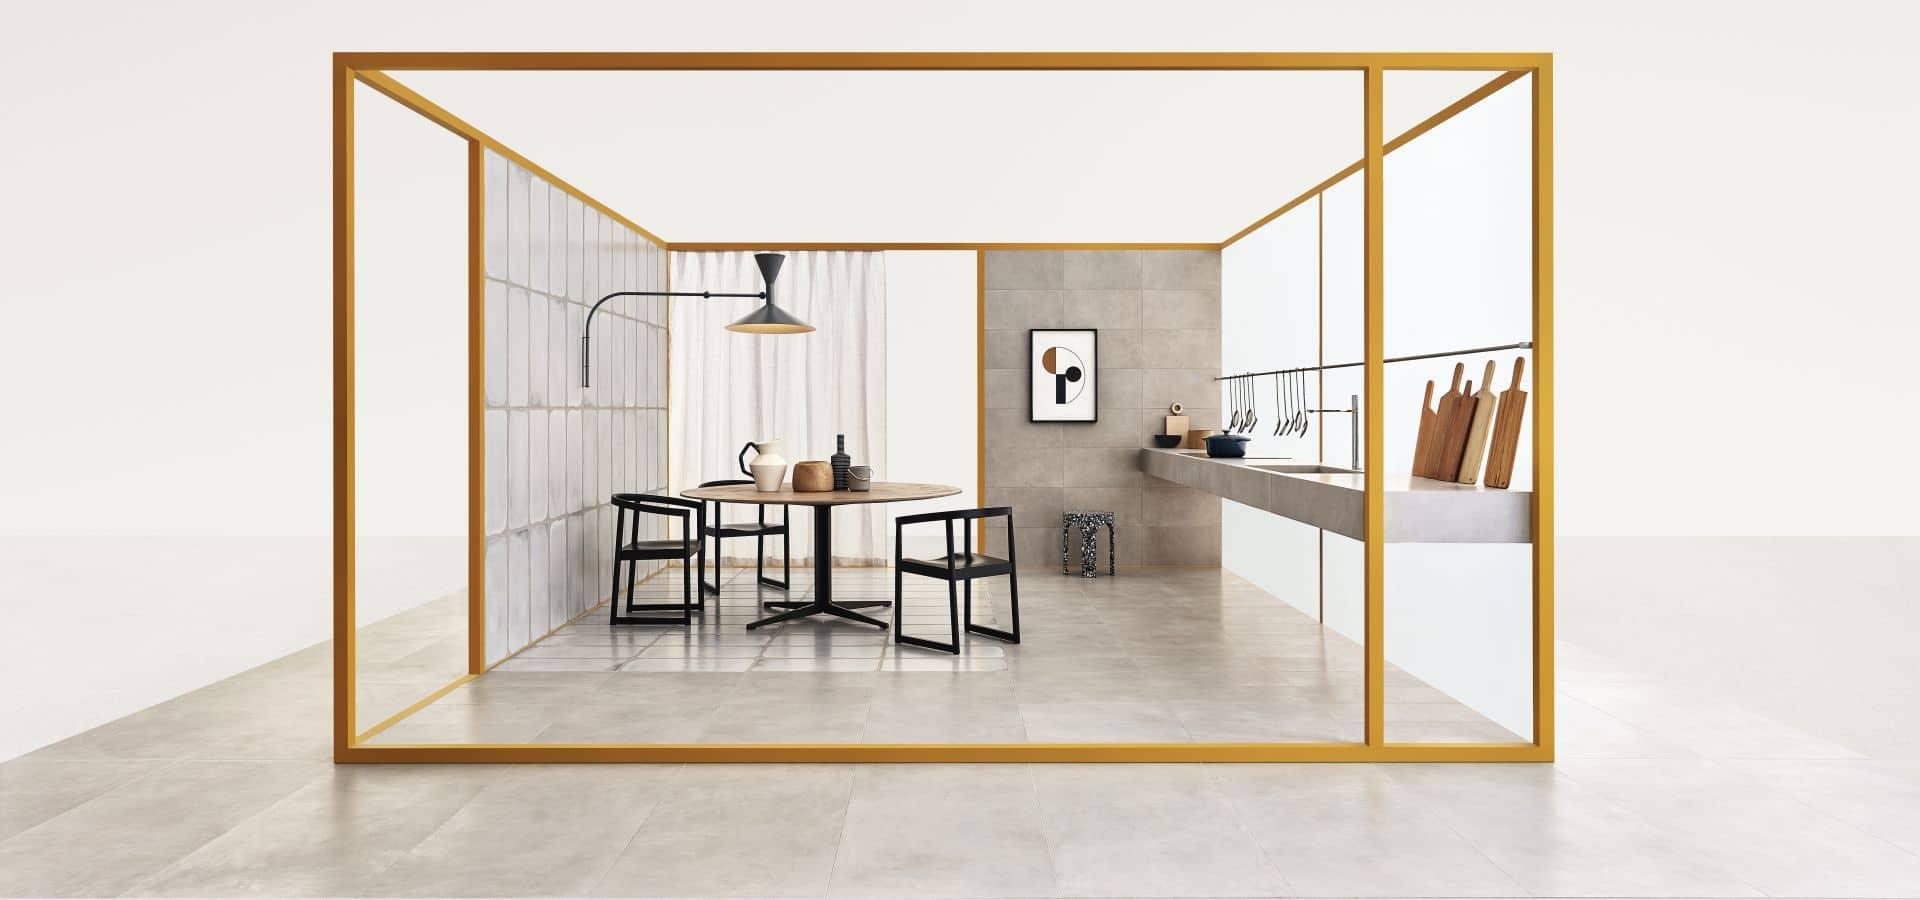 shades lmcs la maison du carrelage balma toulouse. Black Bedroom Furniture Sets. Home Design Ideas